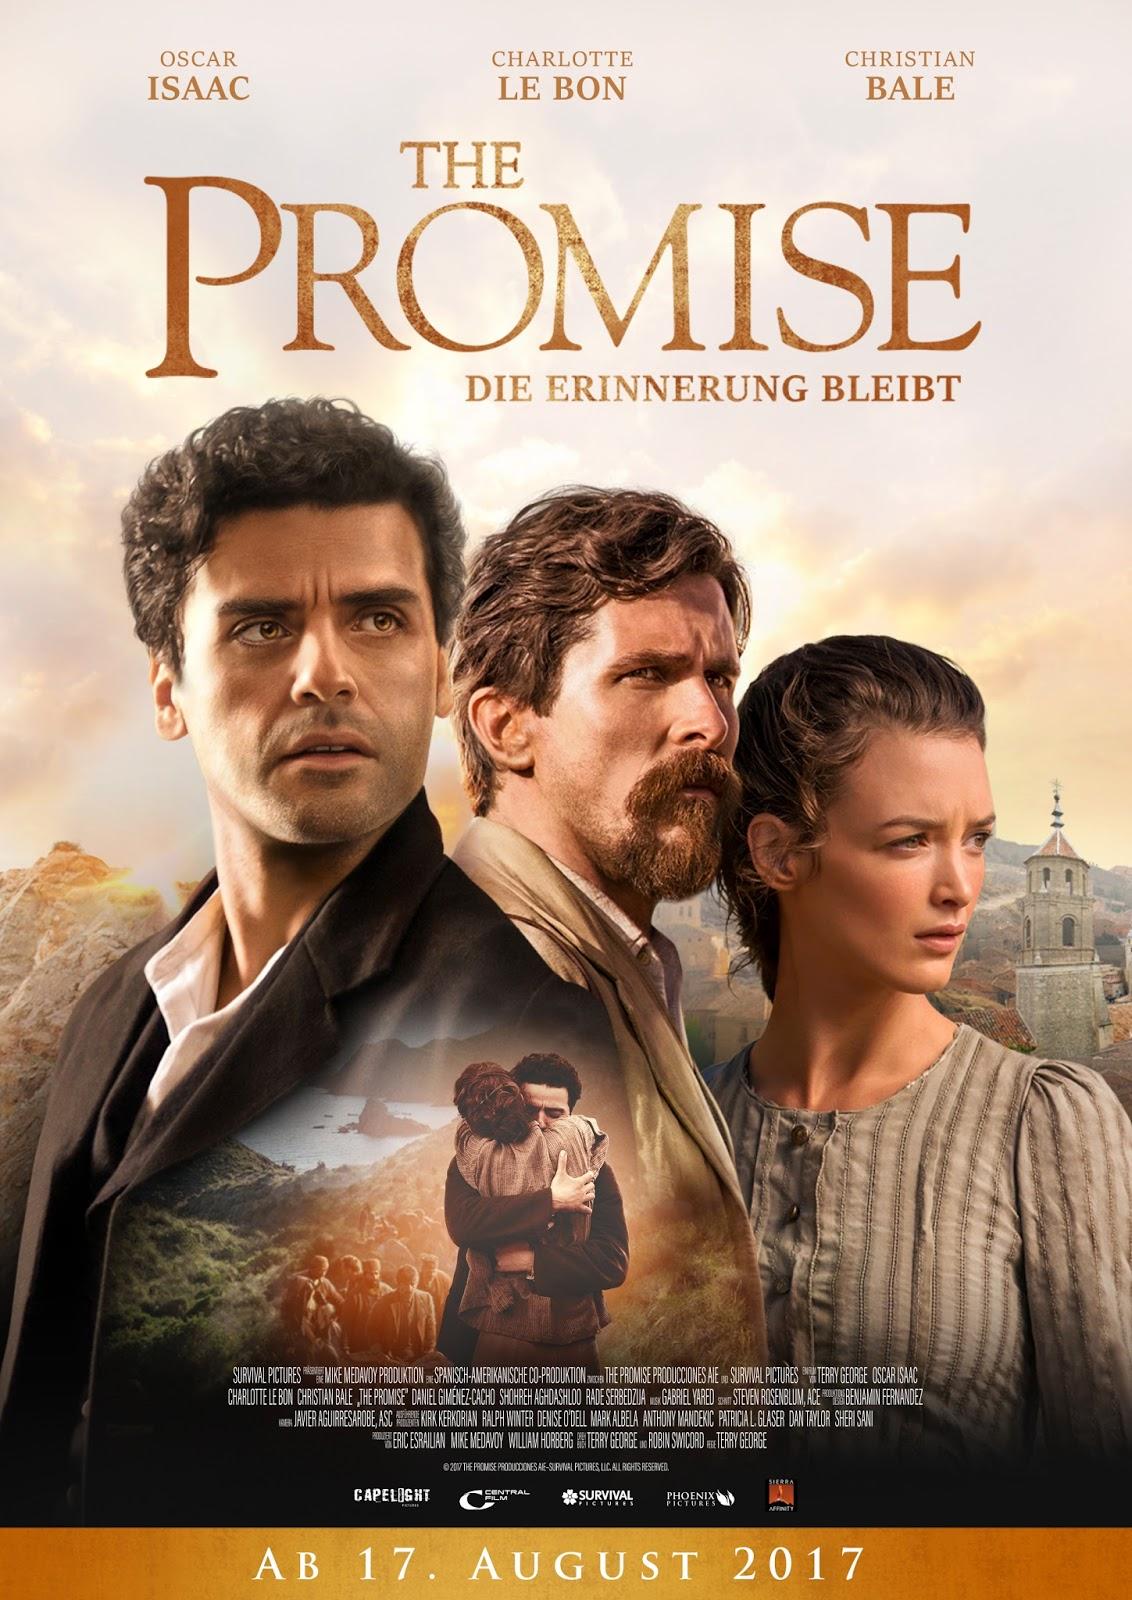 The Promise (Filmkritik)   Die Seilerseite.